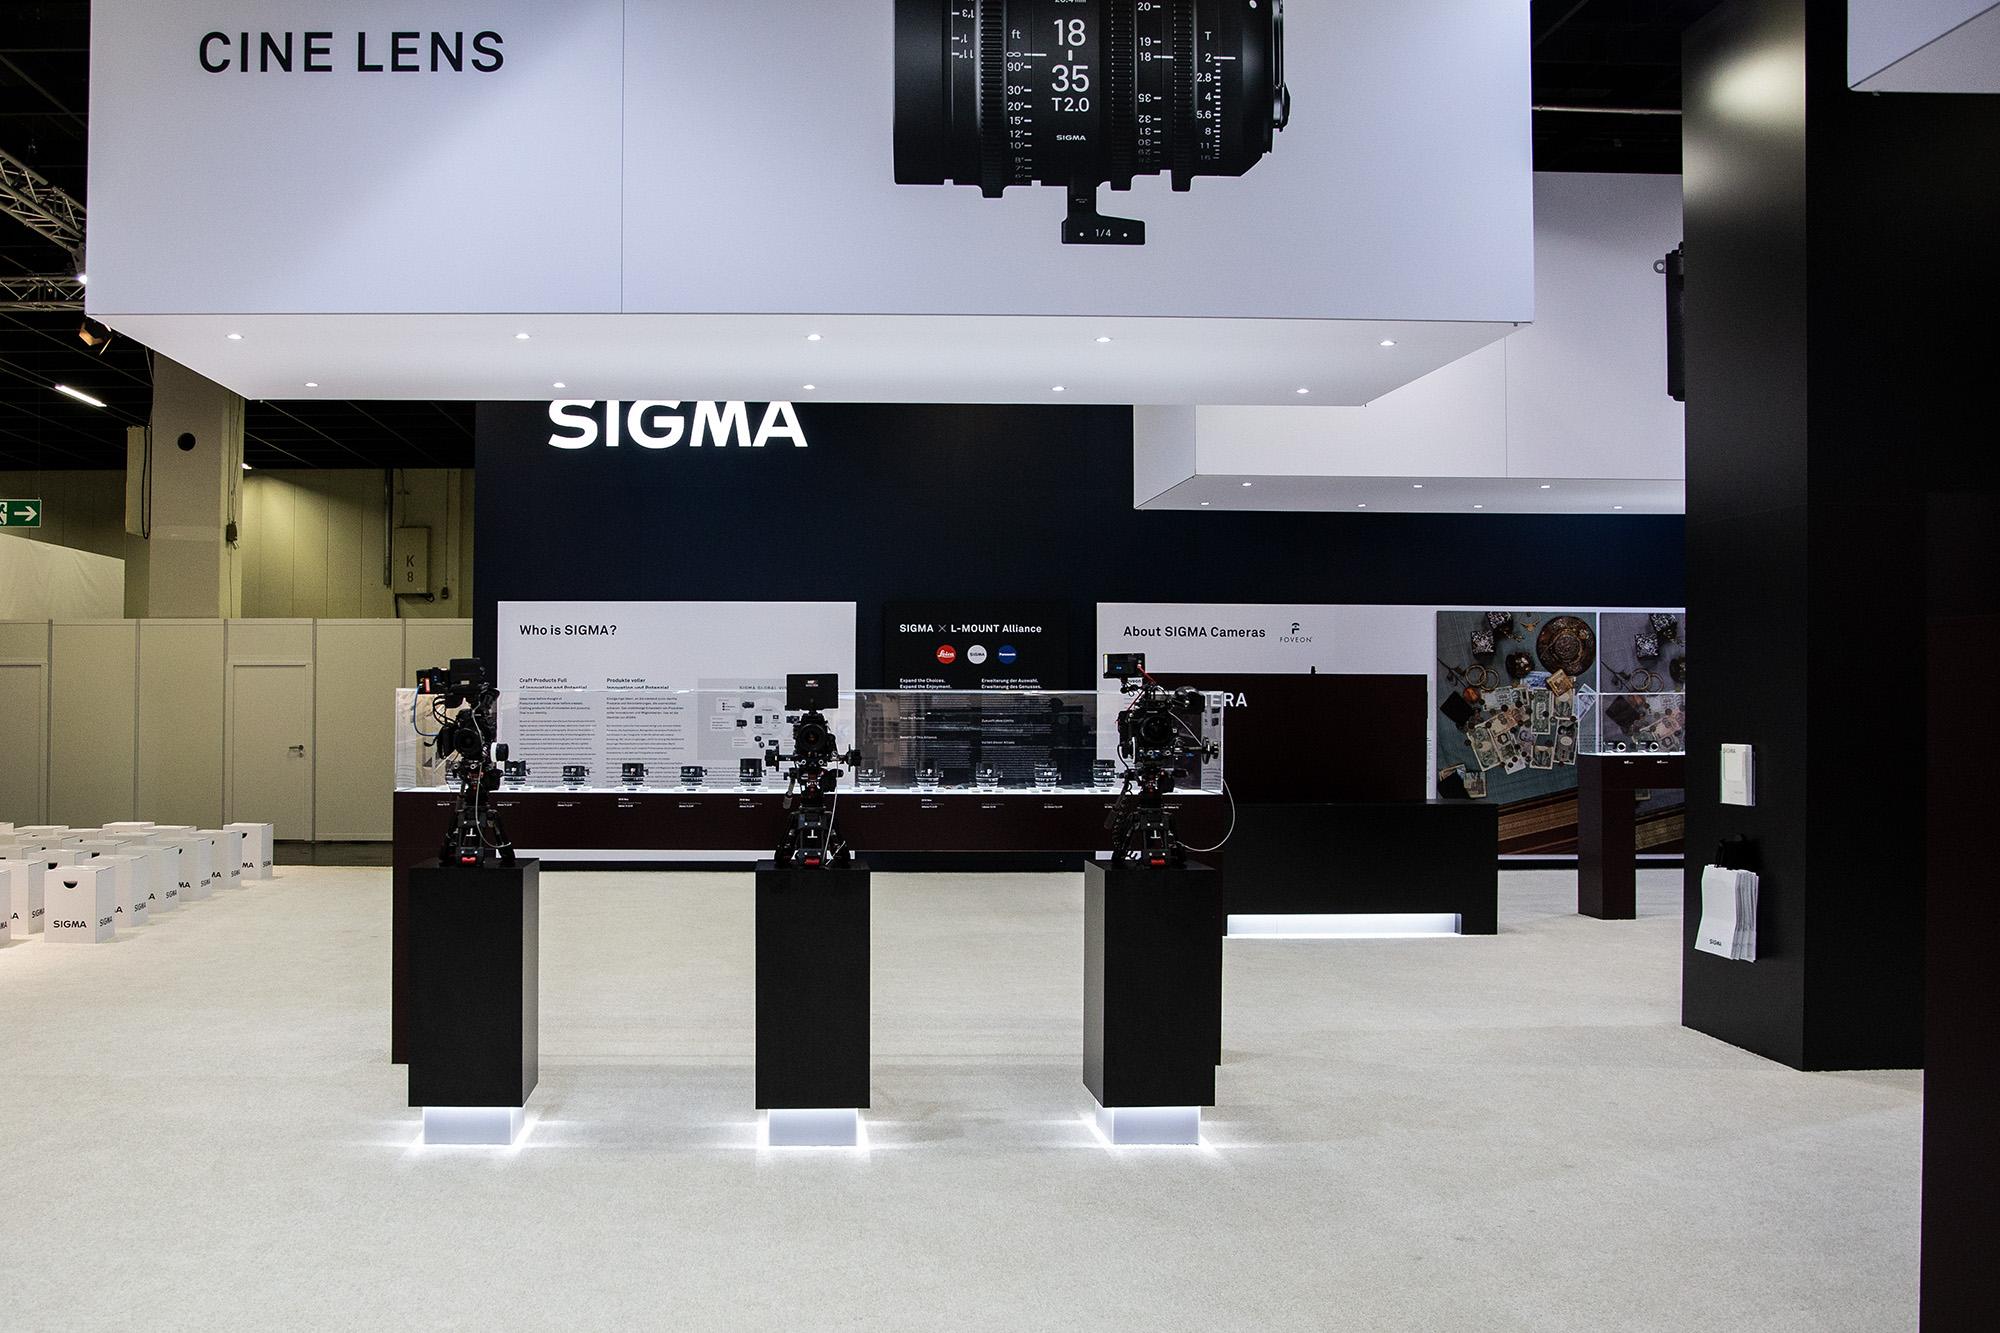 SIGMA Photokina 2018